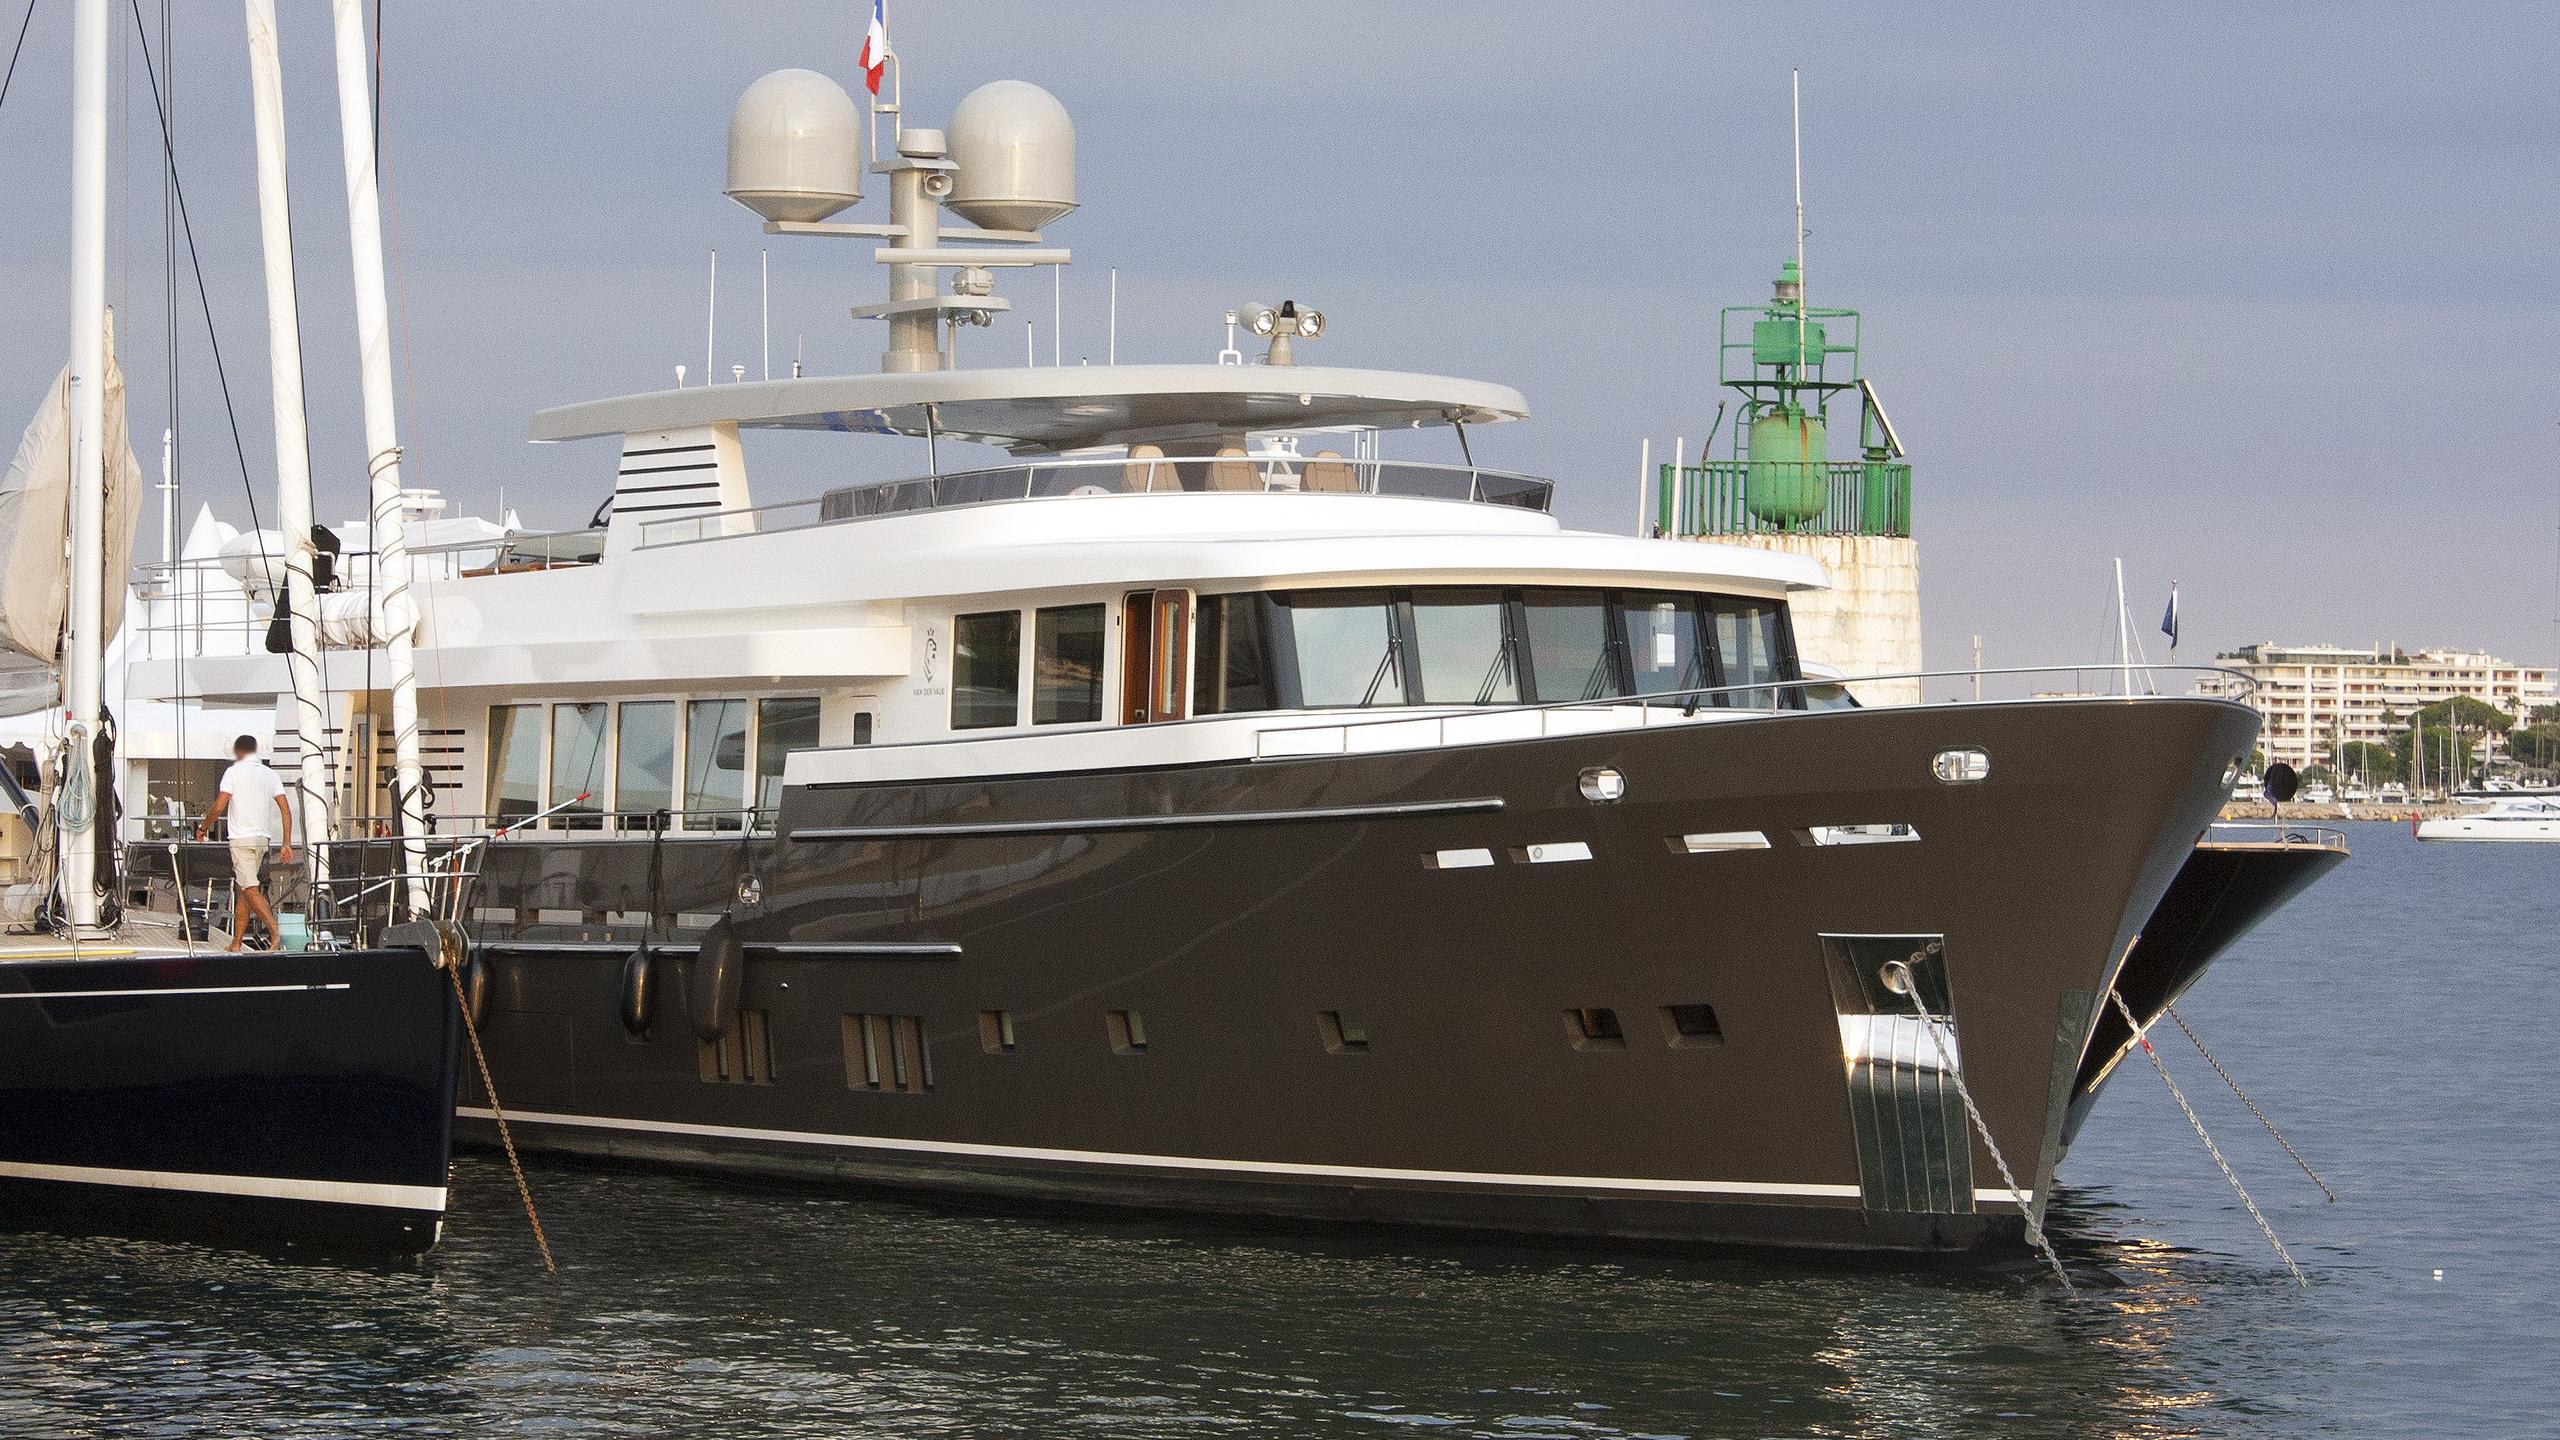 santa-maria-t-motor-yacht-van-der-valk-continental-trawler-2015-37m-bow